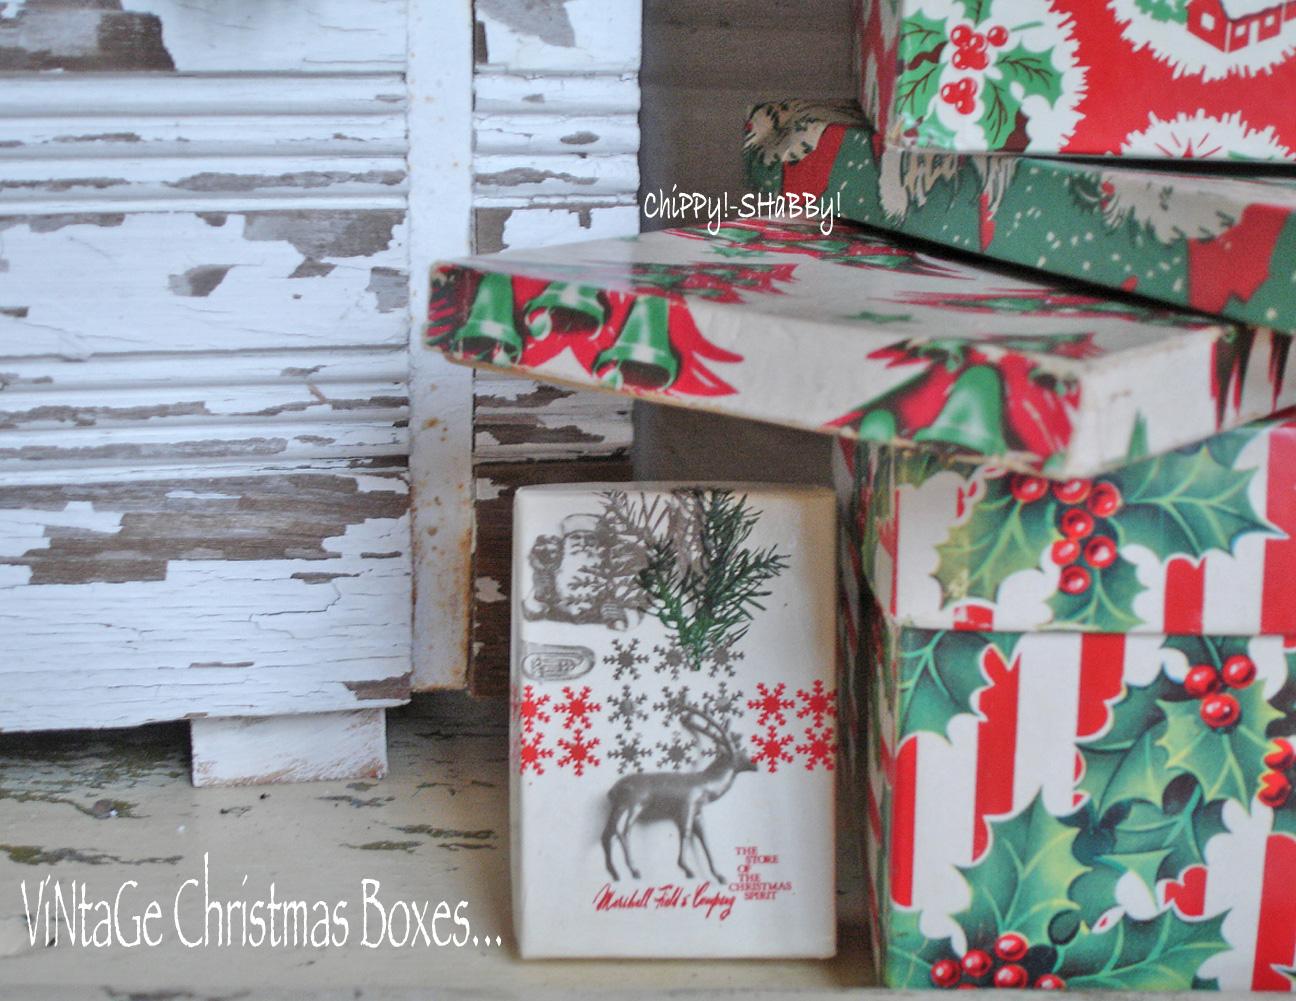 http://2.bp.blogspot.com/-sBO2OgalCUM/TutbTwgTyjI/AAAAAAAAFWI/HZ3Q4oa9hxw/s1600/vintage+christmas+boxes-chippy+shabby.jpg